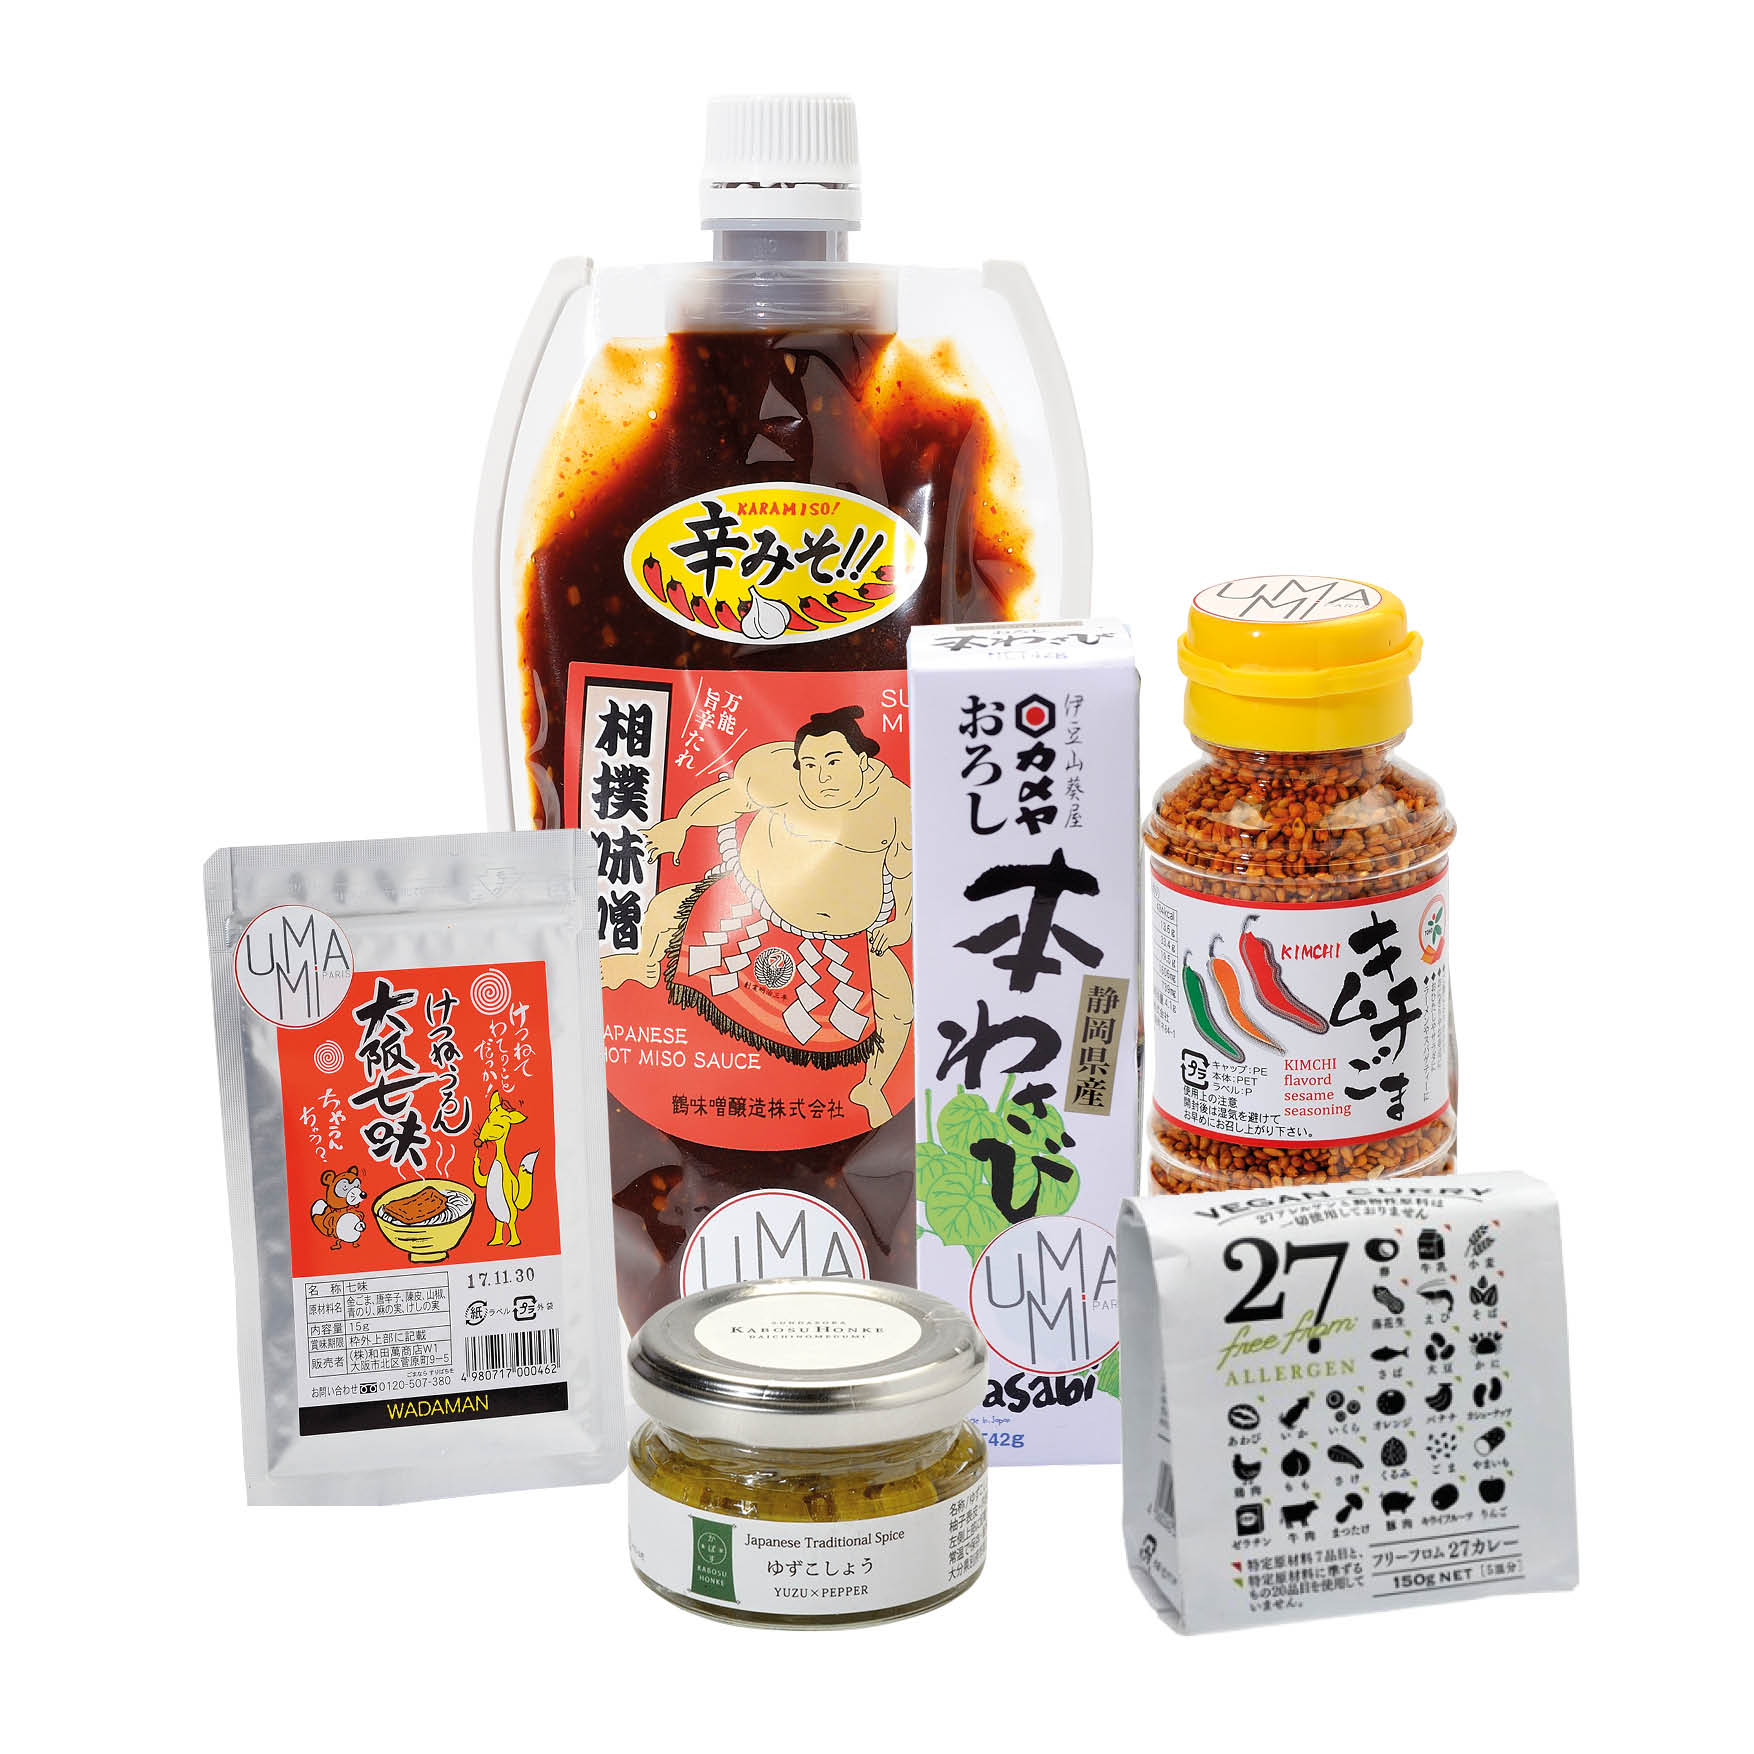 Yuzu kosho pepper japonais Japanese kabosu kosho black charcoal miso piquant miso paste miso soup wasabi hon wasabi Shichimi togarashi sésame au kimchi coreen curry japonais